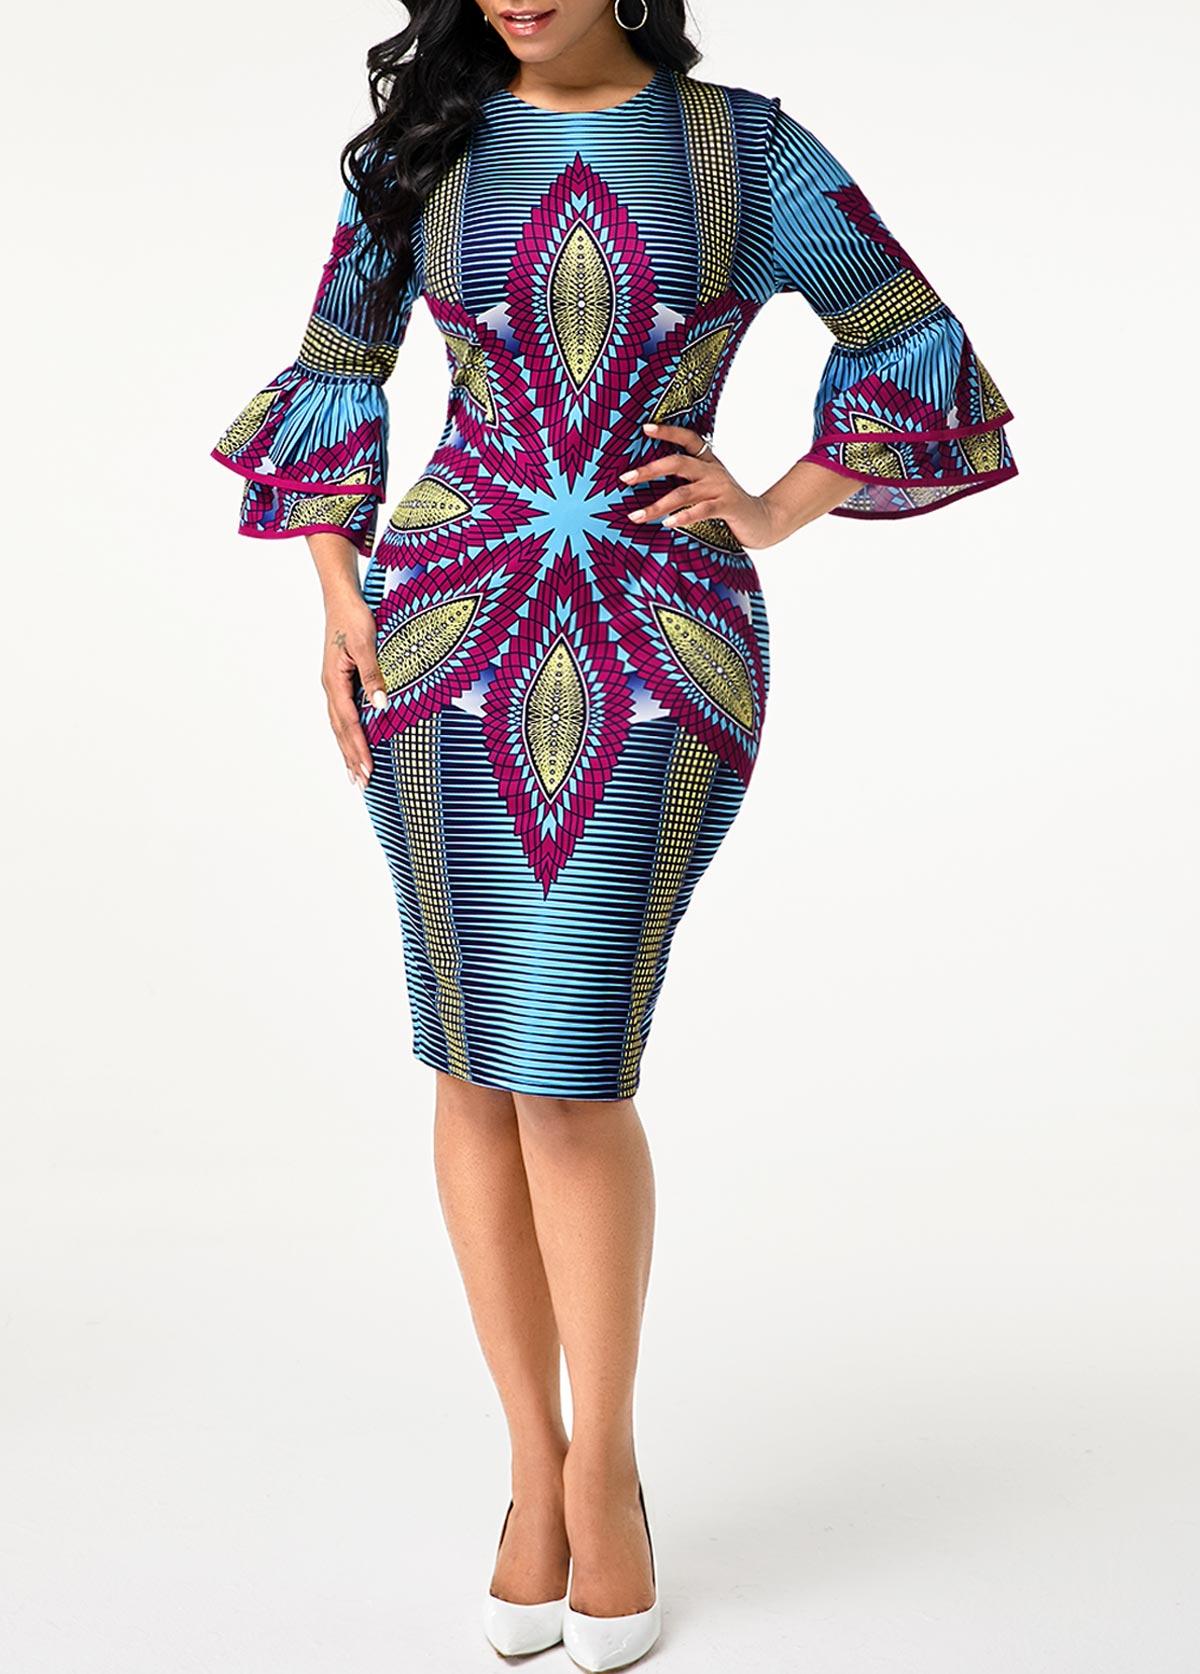 Tribal Print Round Neck Flare Sleeve Dress